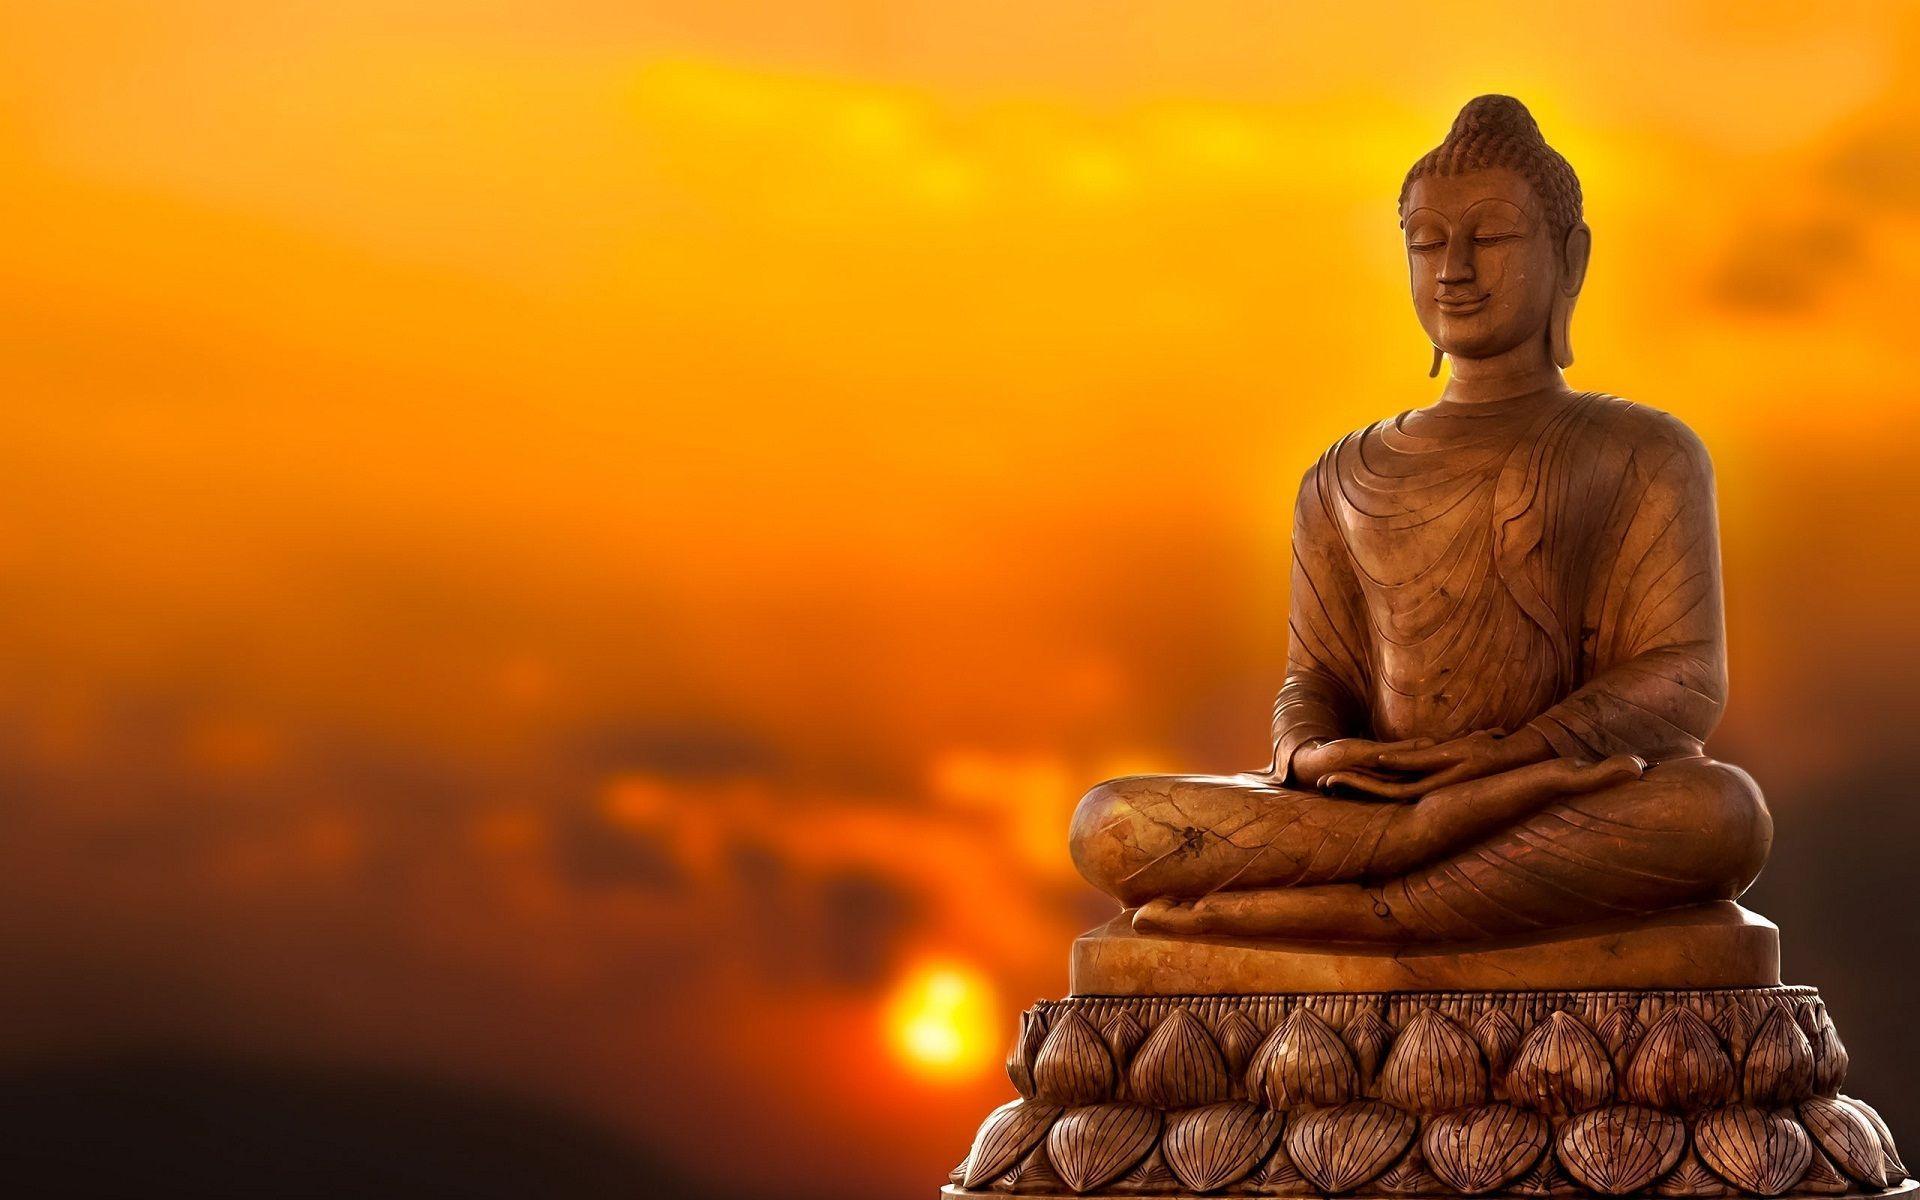 Lord Buddha Hd Desktop Wallpapers Wallpaper Cave